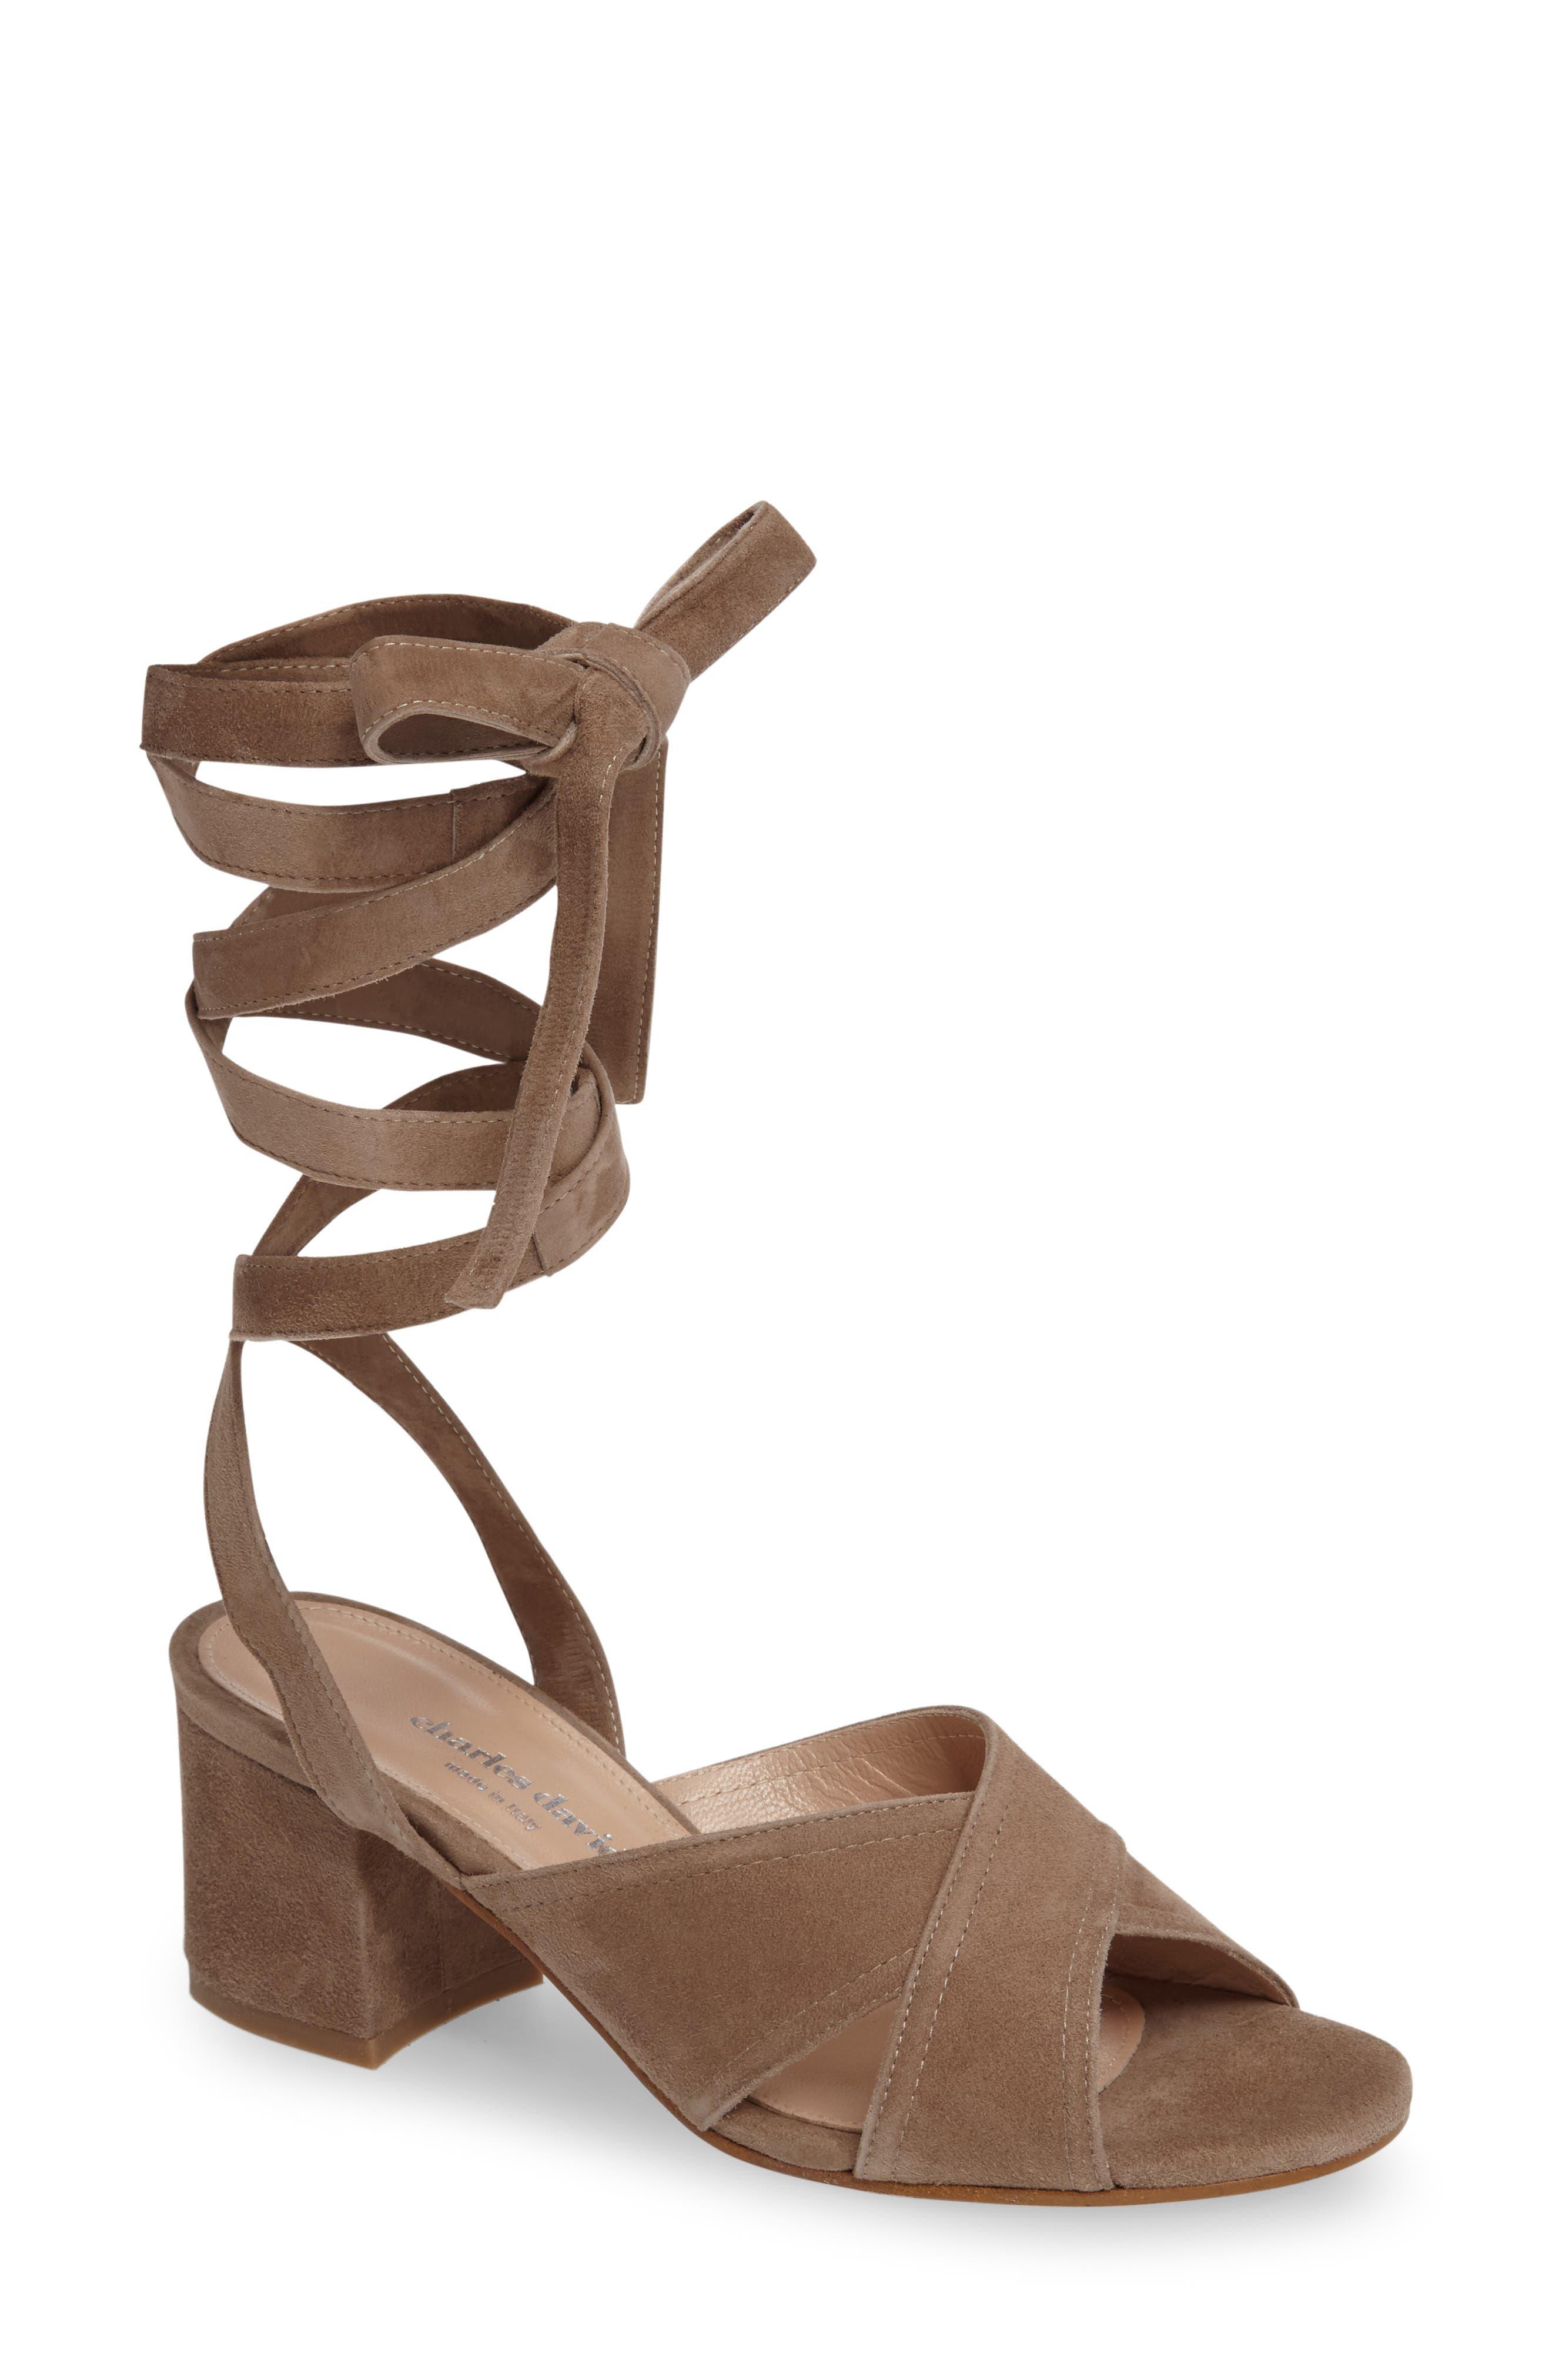 Alternate Image 1 Selected - Charles David Blossom Wraparound Sandal (Women)